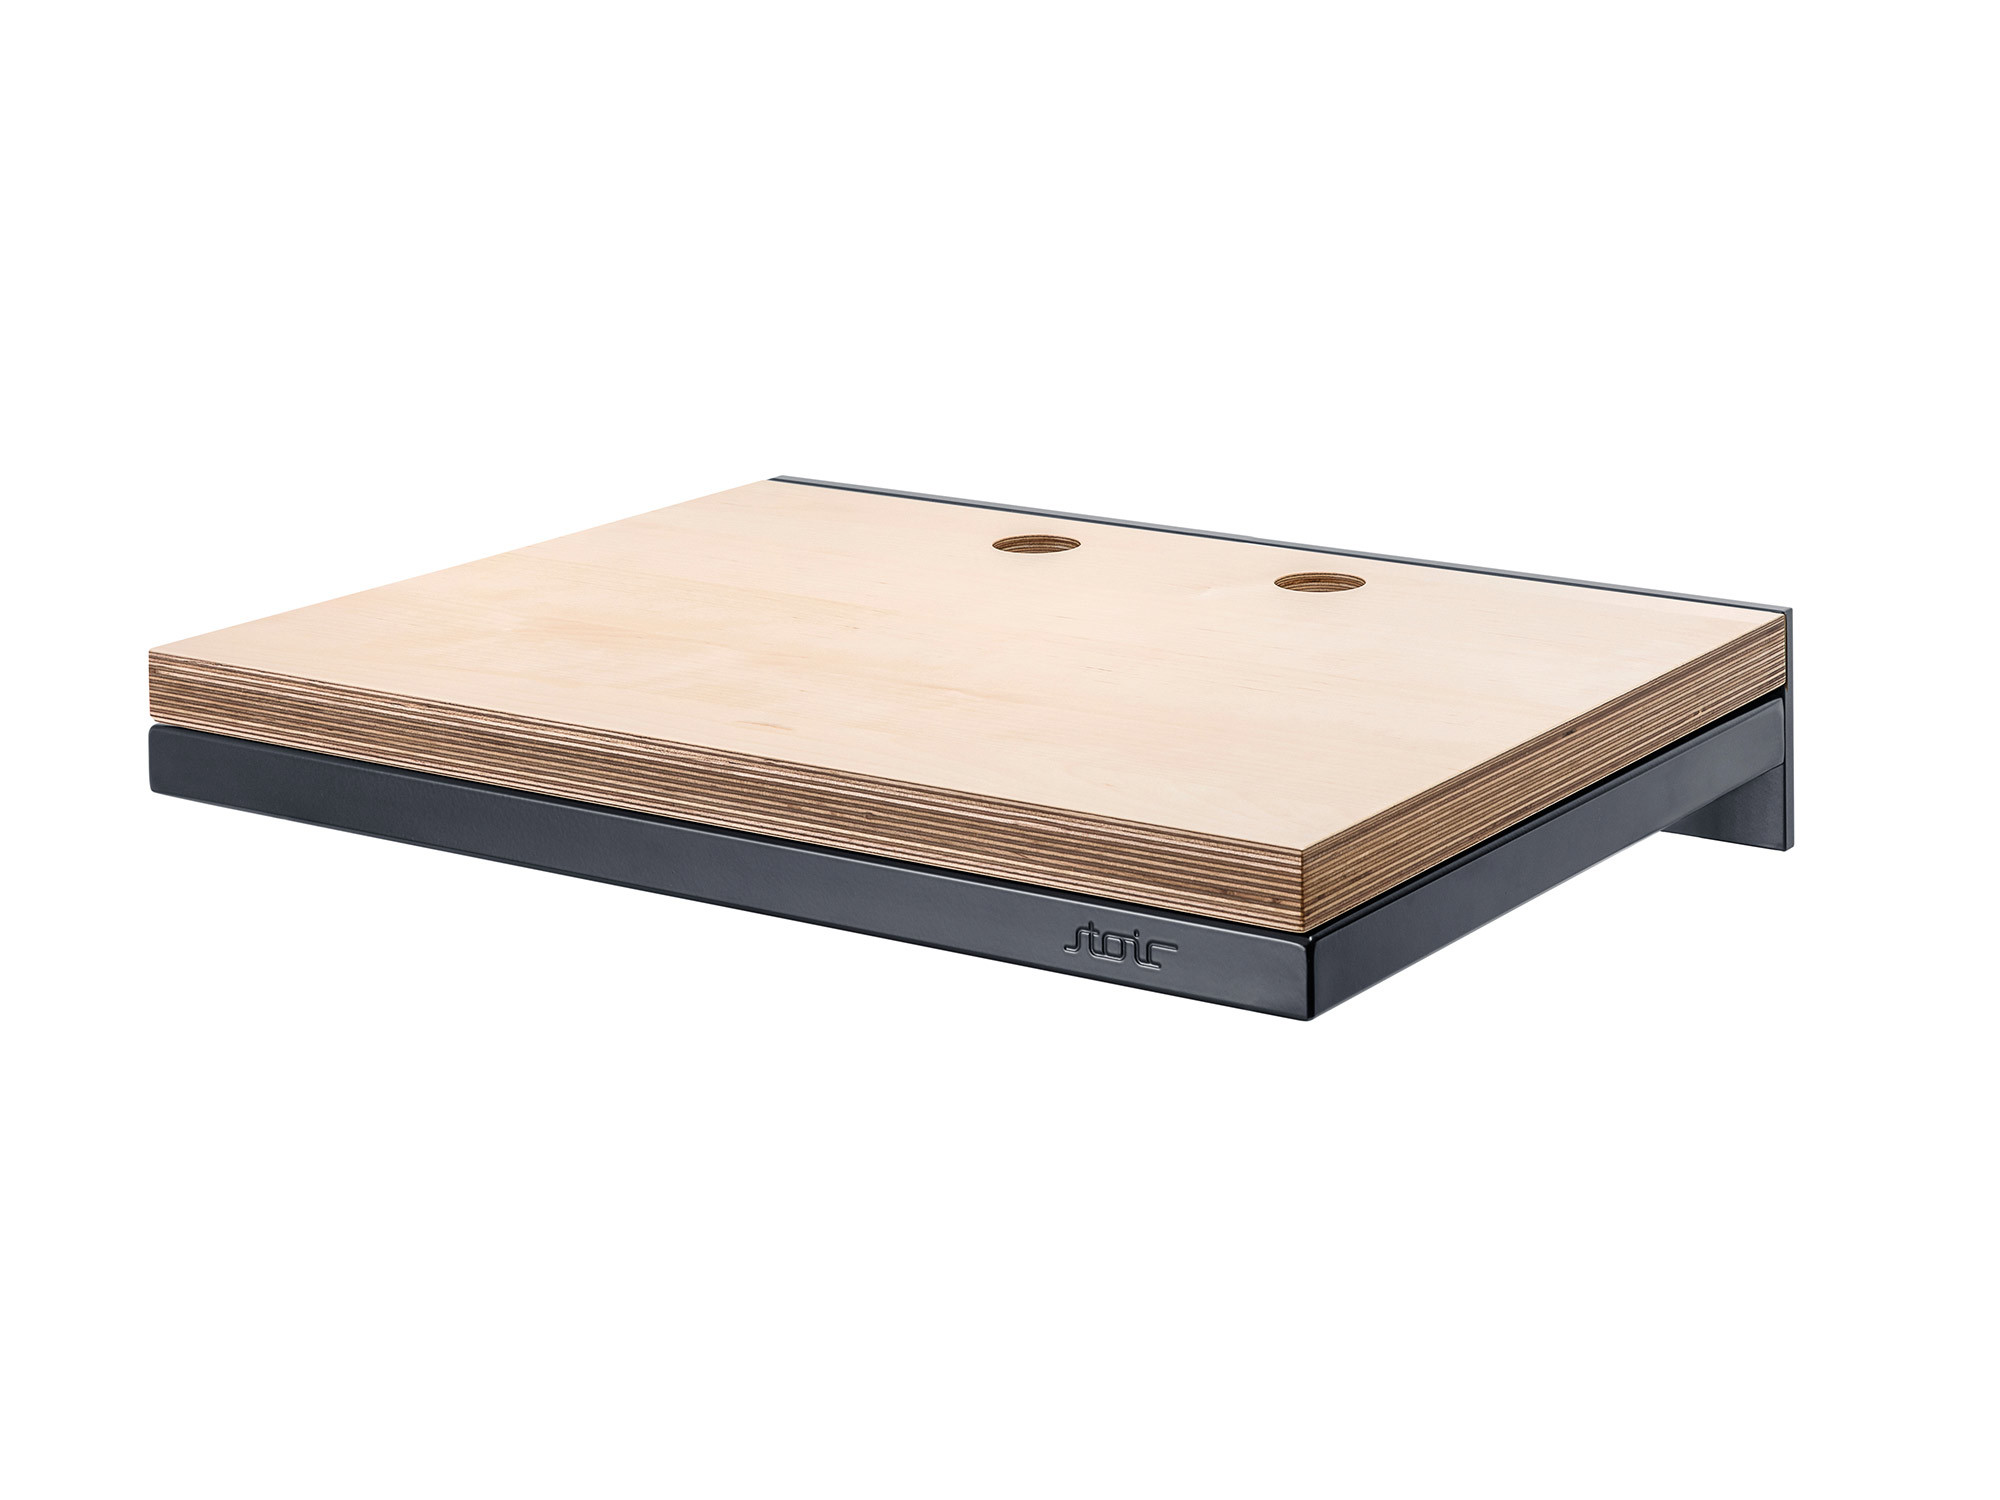 Inakustik Stoic Stainless steel frame, 50x55, Slate